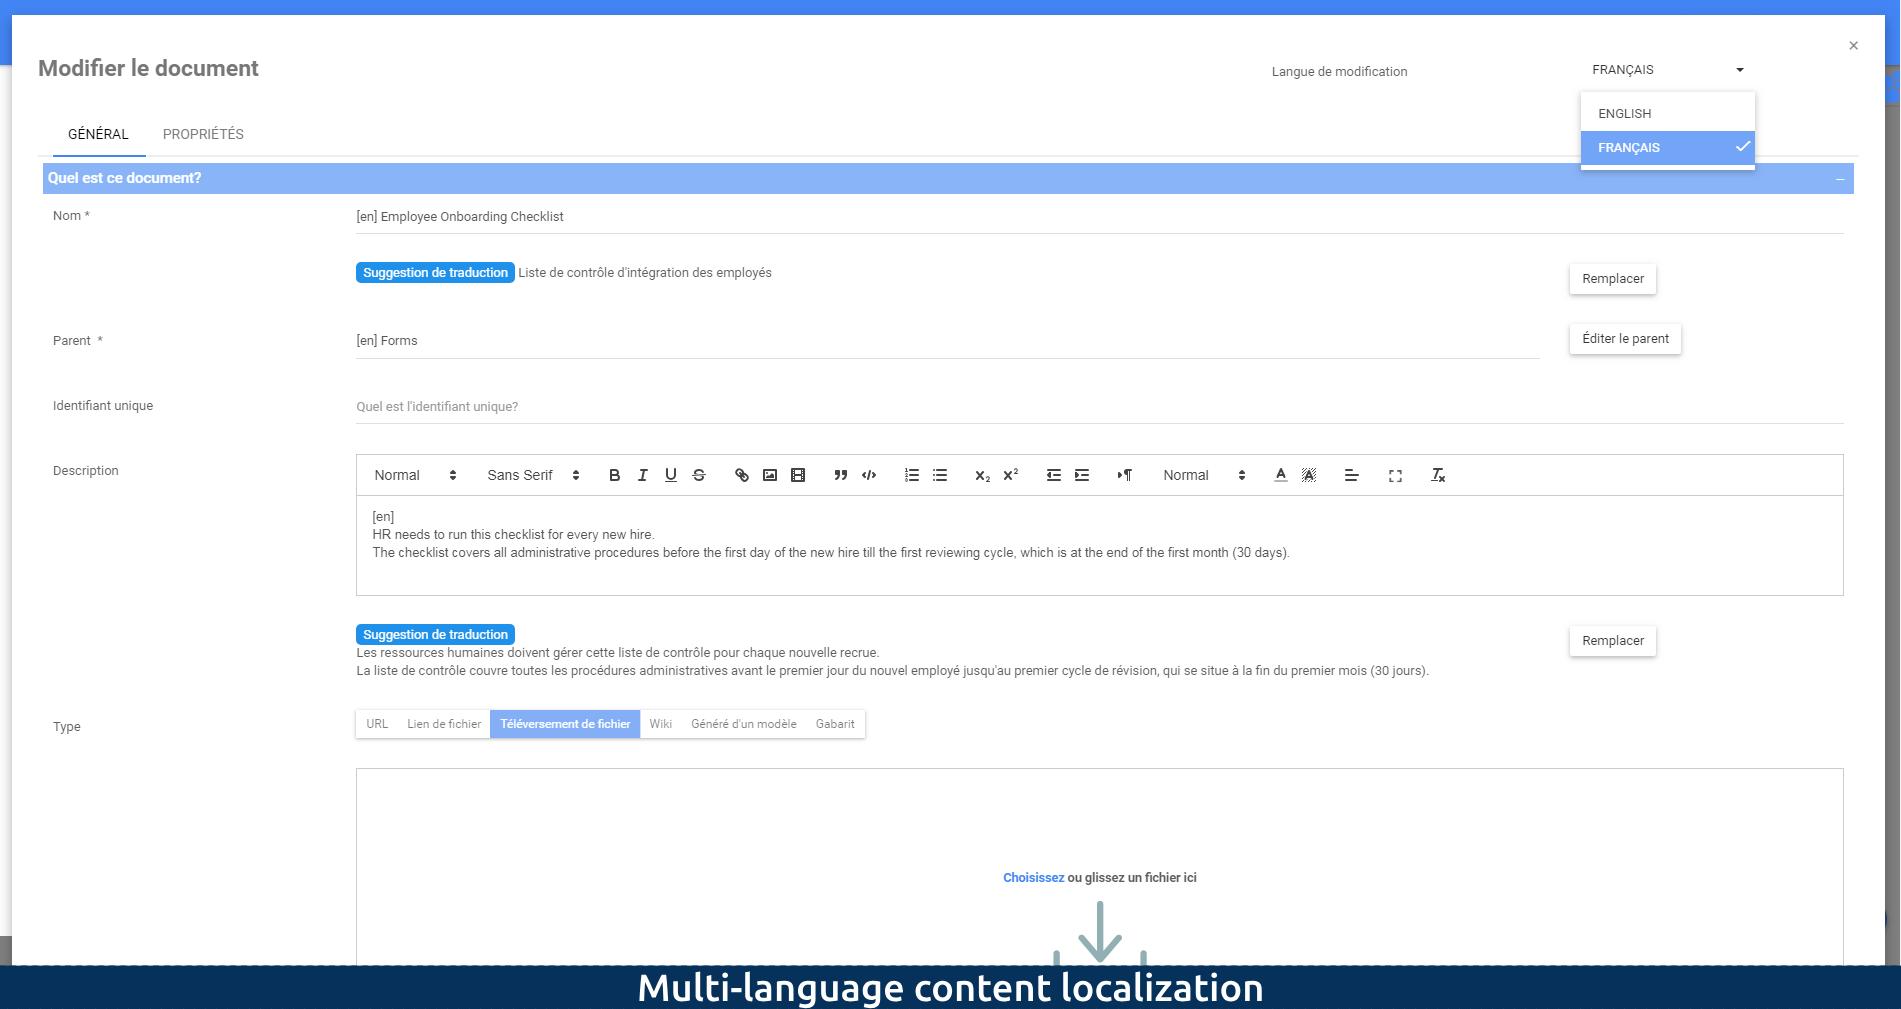 Multi-language content localization